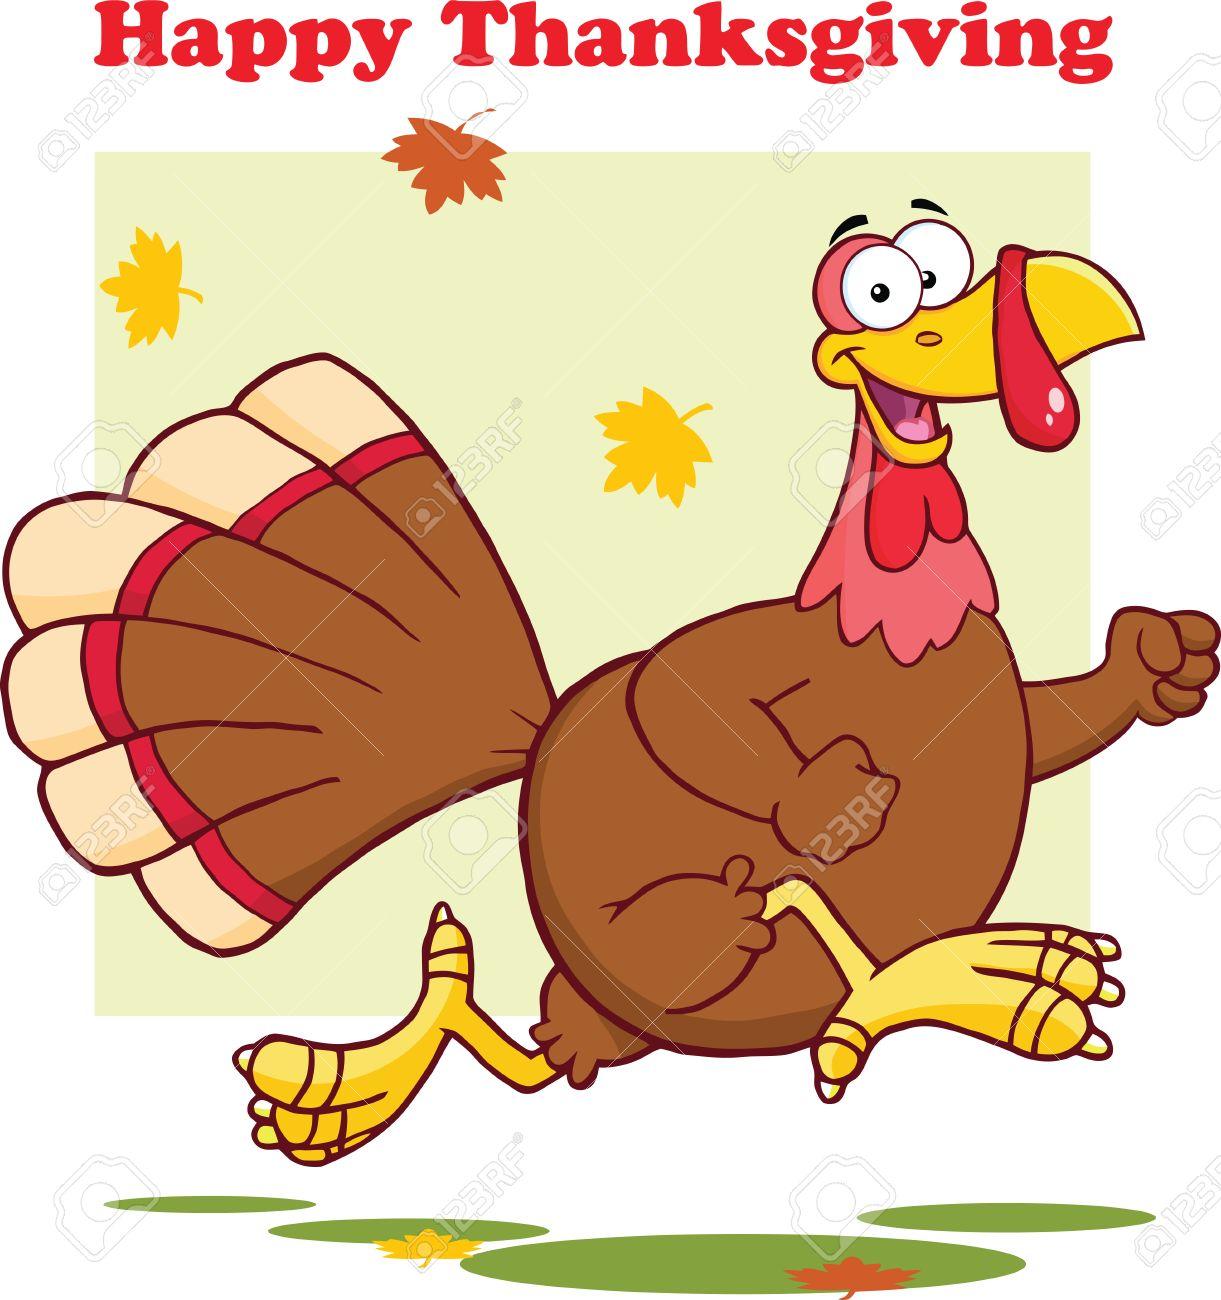 Fullsize Of Funny Happy Thanksgiving